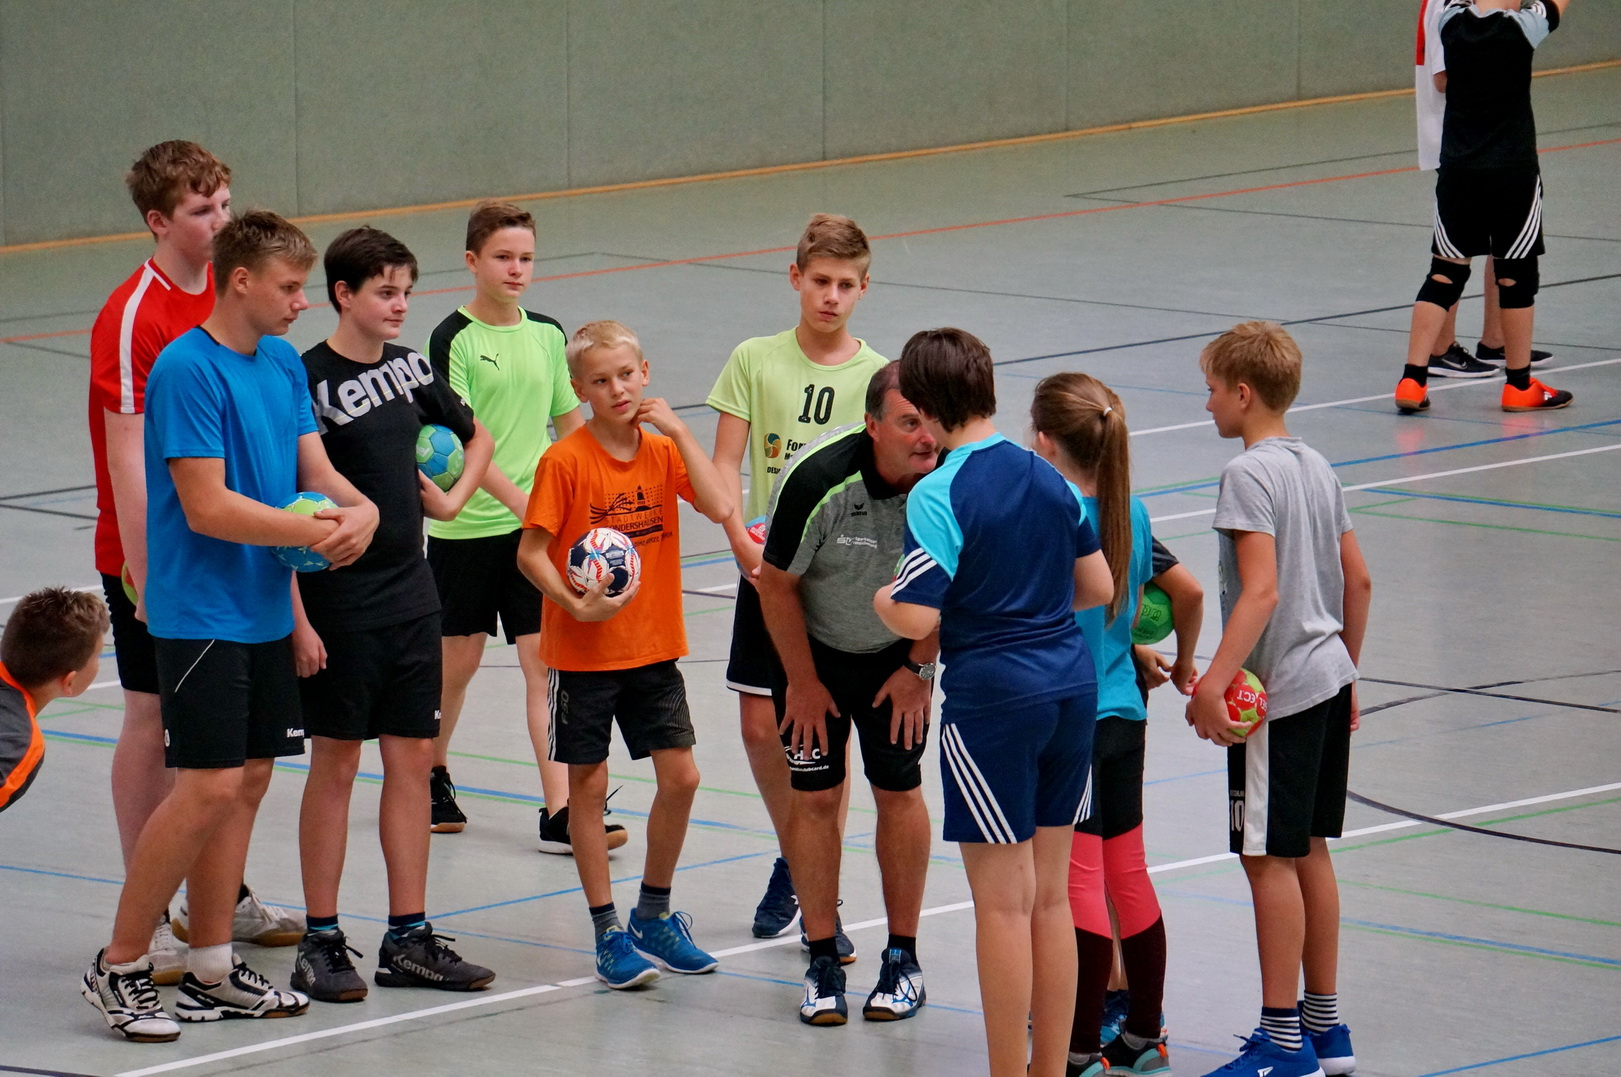 201808_Handballcamp_SDH_MG_097w